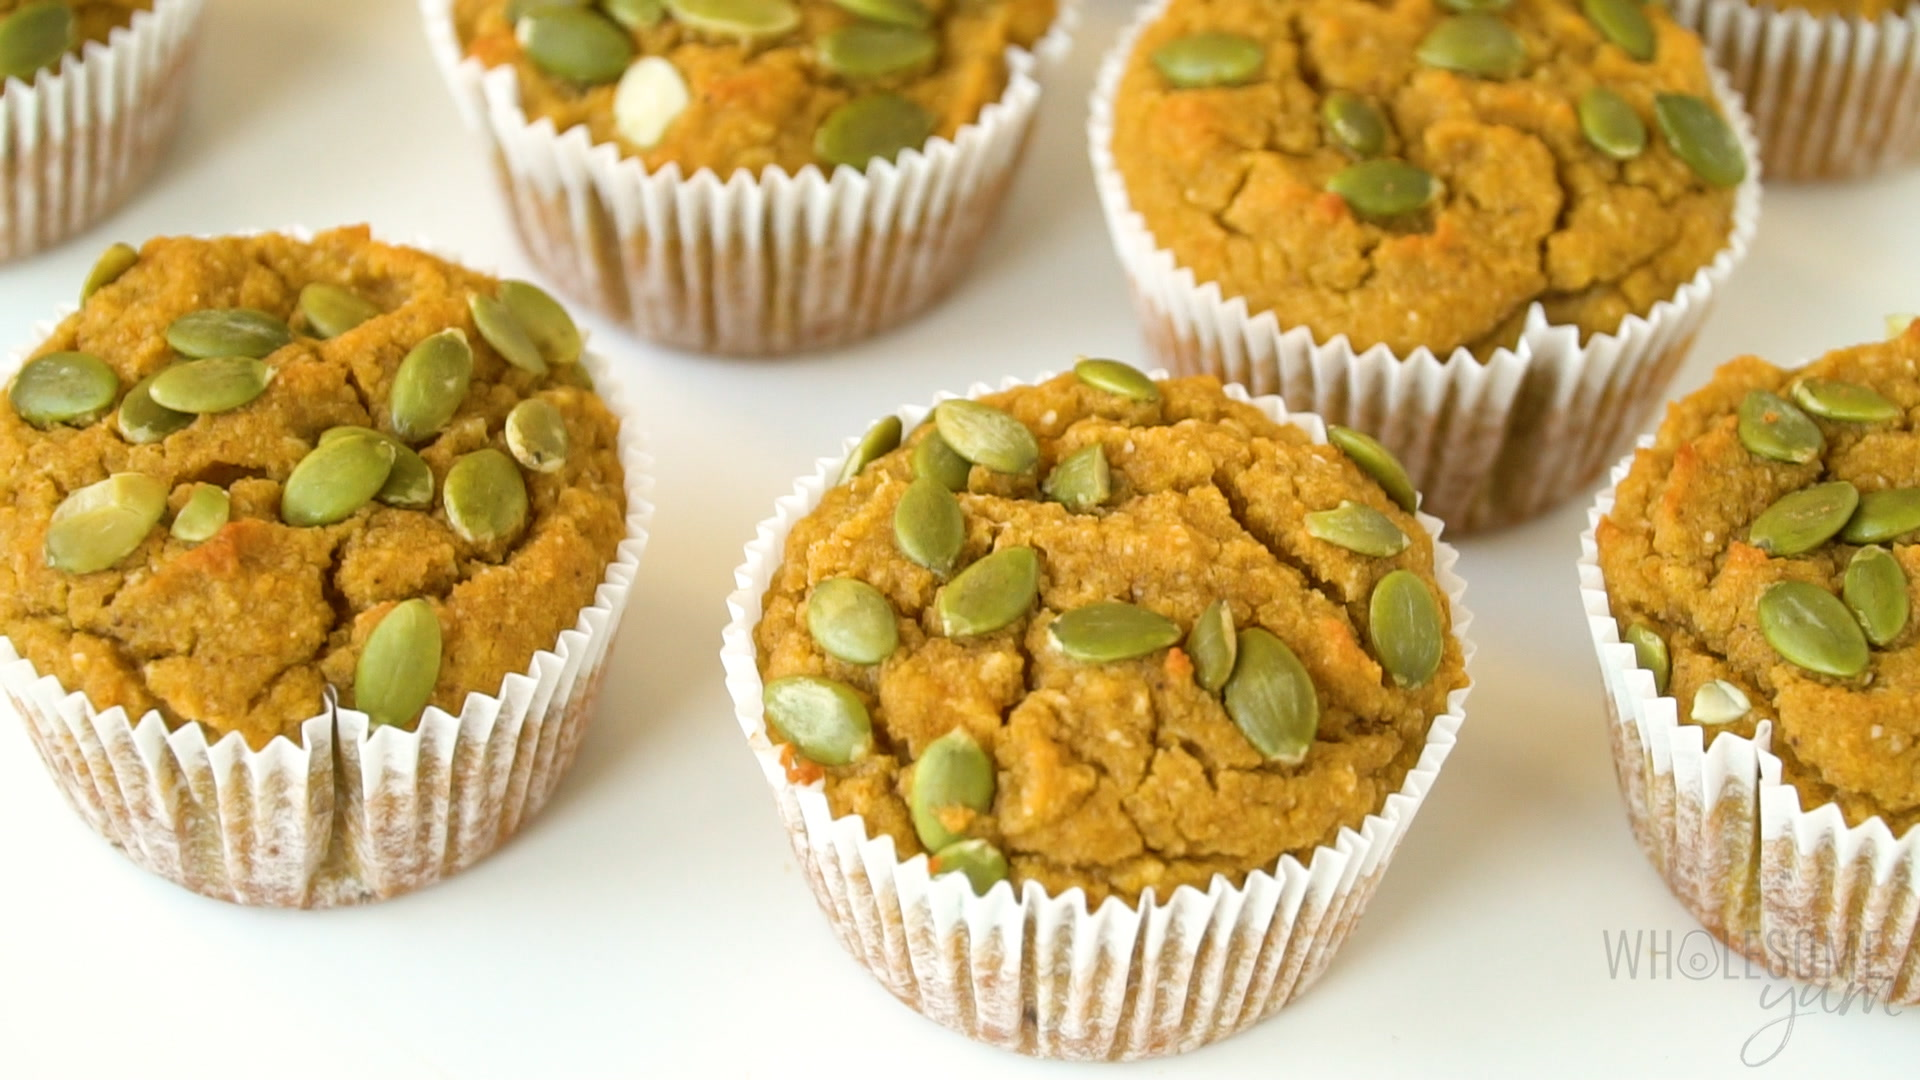 Keto Low Carb Pumpkin Muffins Recipe with Coconut Flour & Almond Flour